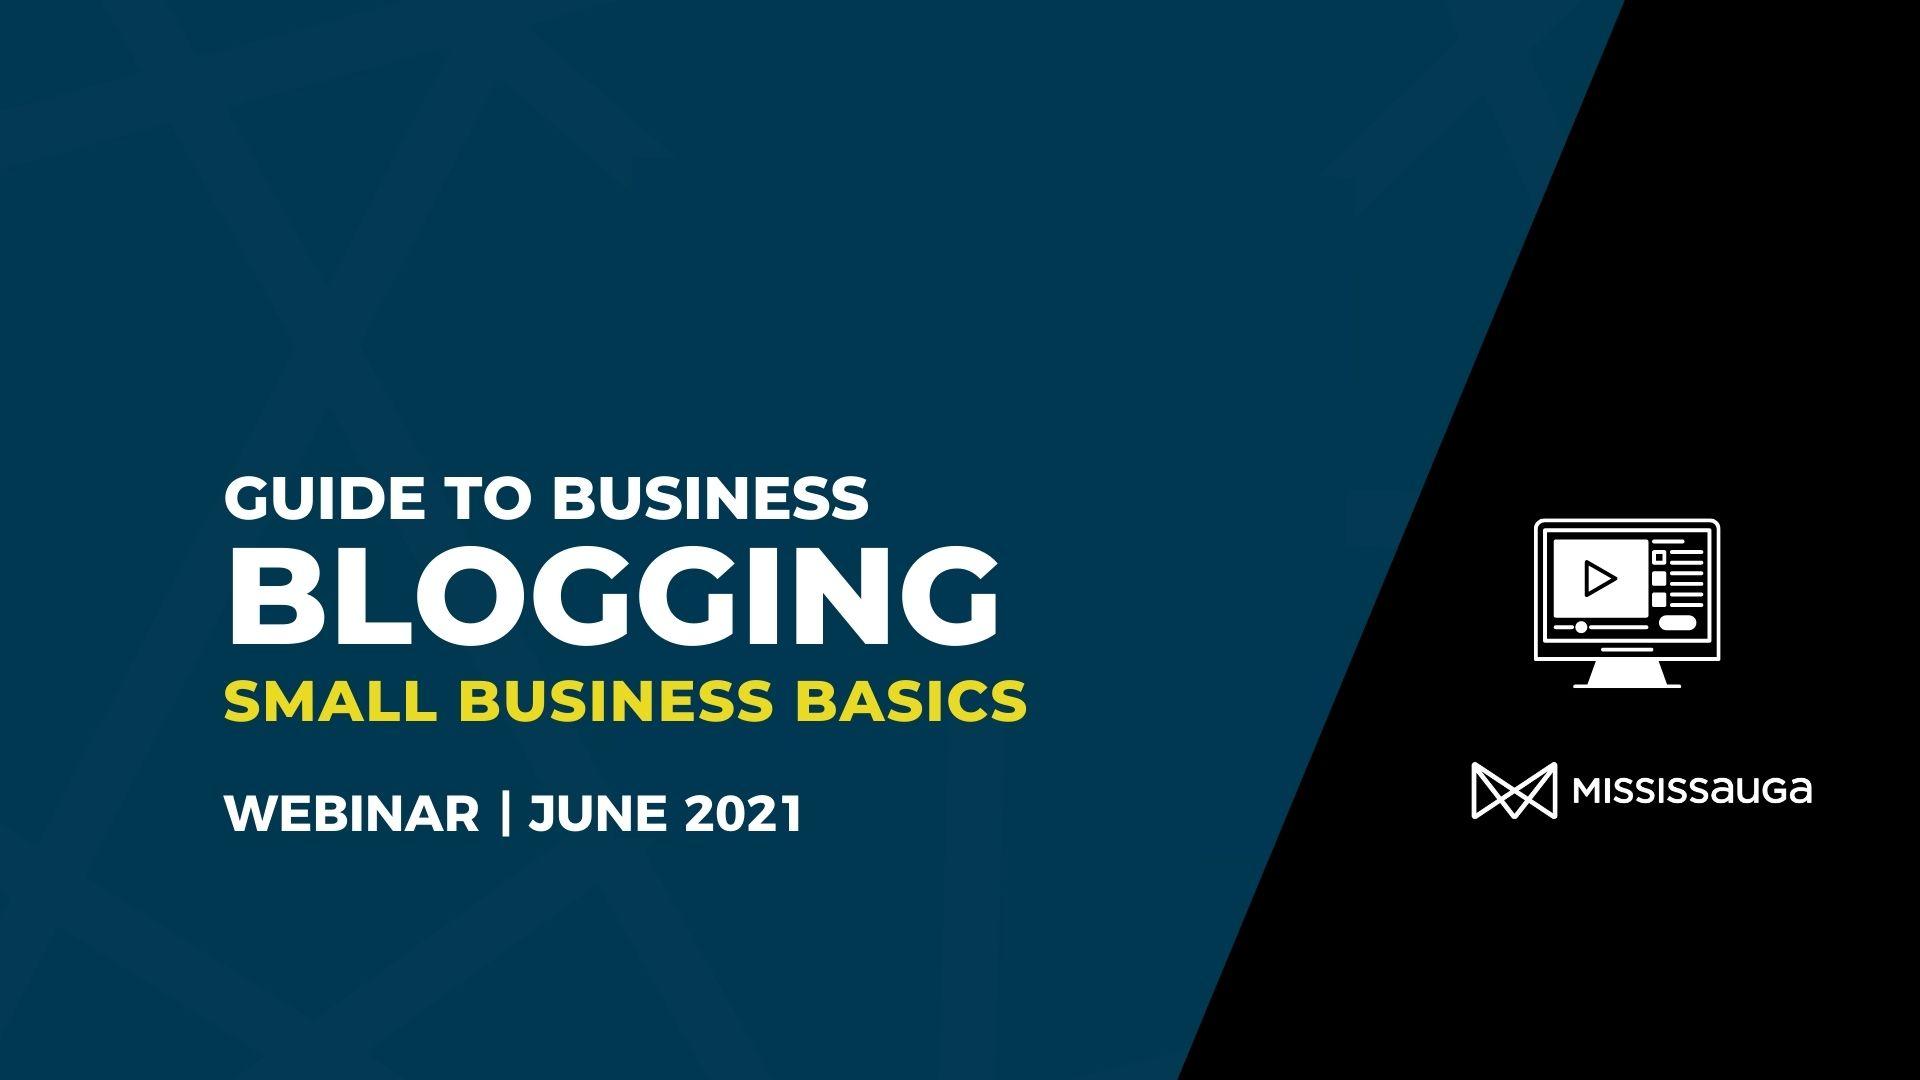 Guide to Business Blogging – Webinar, June 1